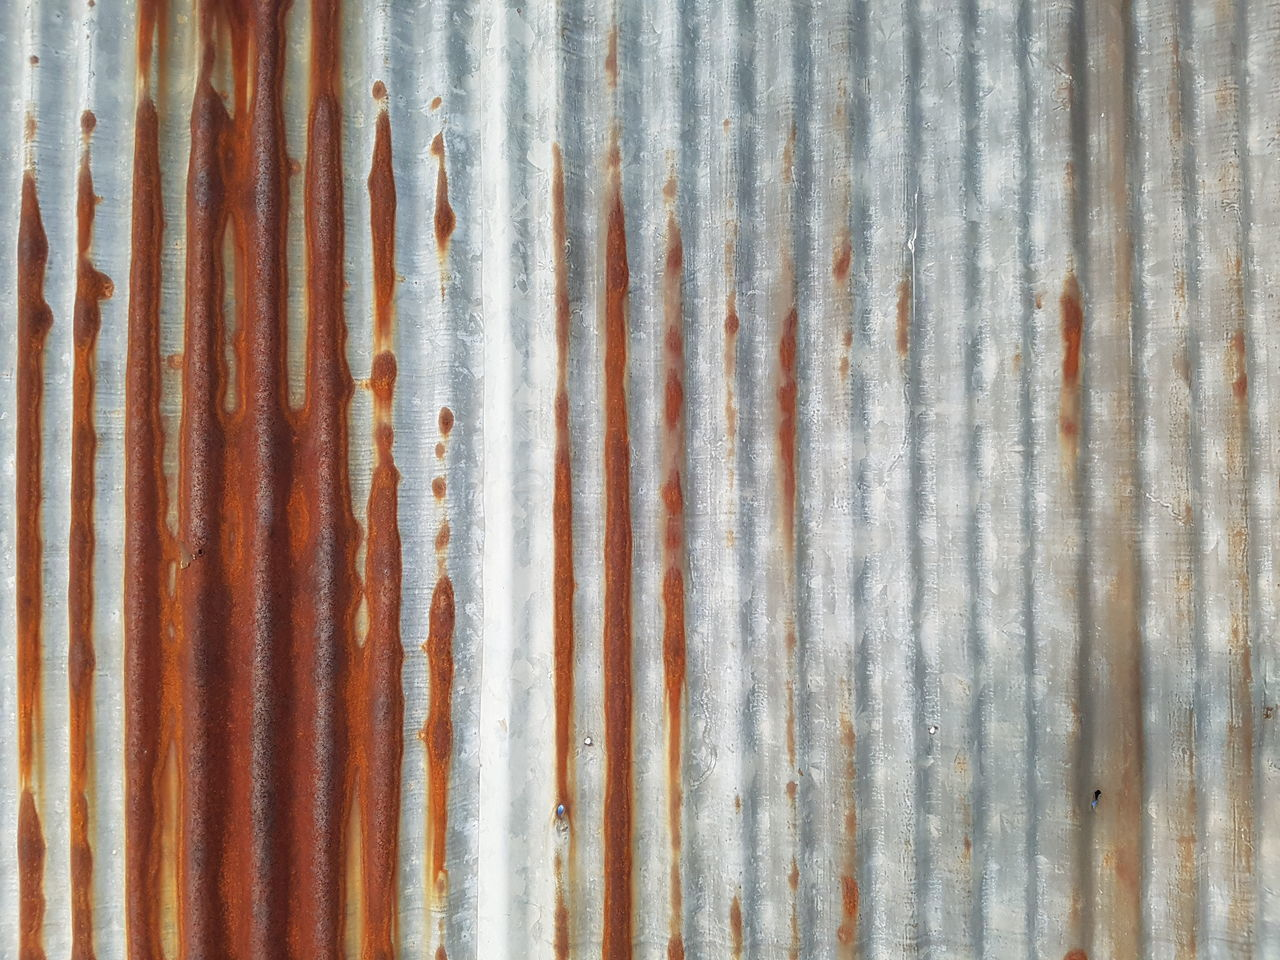 Metal Backgrounds Rusty Sheet รั่ว สังกะสี